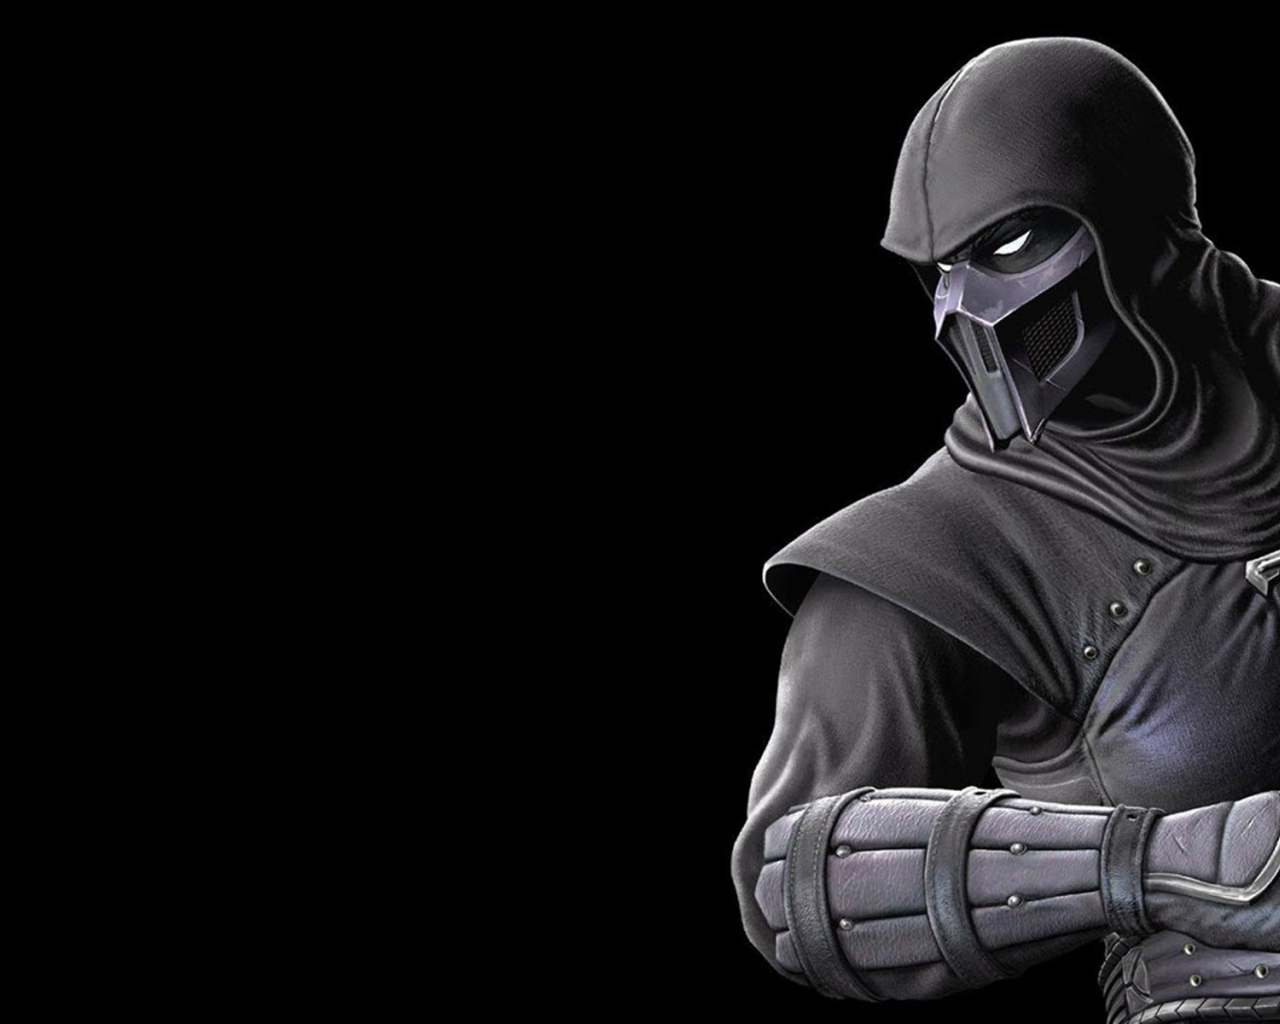 Free Download Wallpaper Mortal Kombat Scorpion Hd Wallpaper Expert